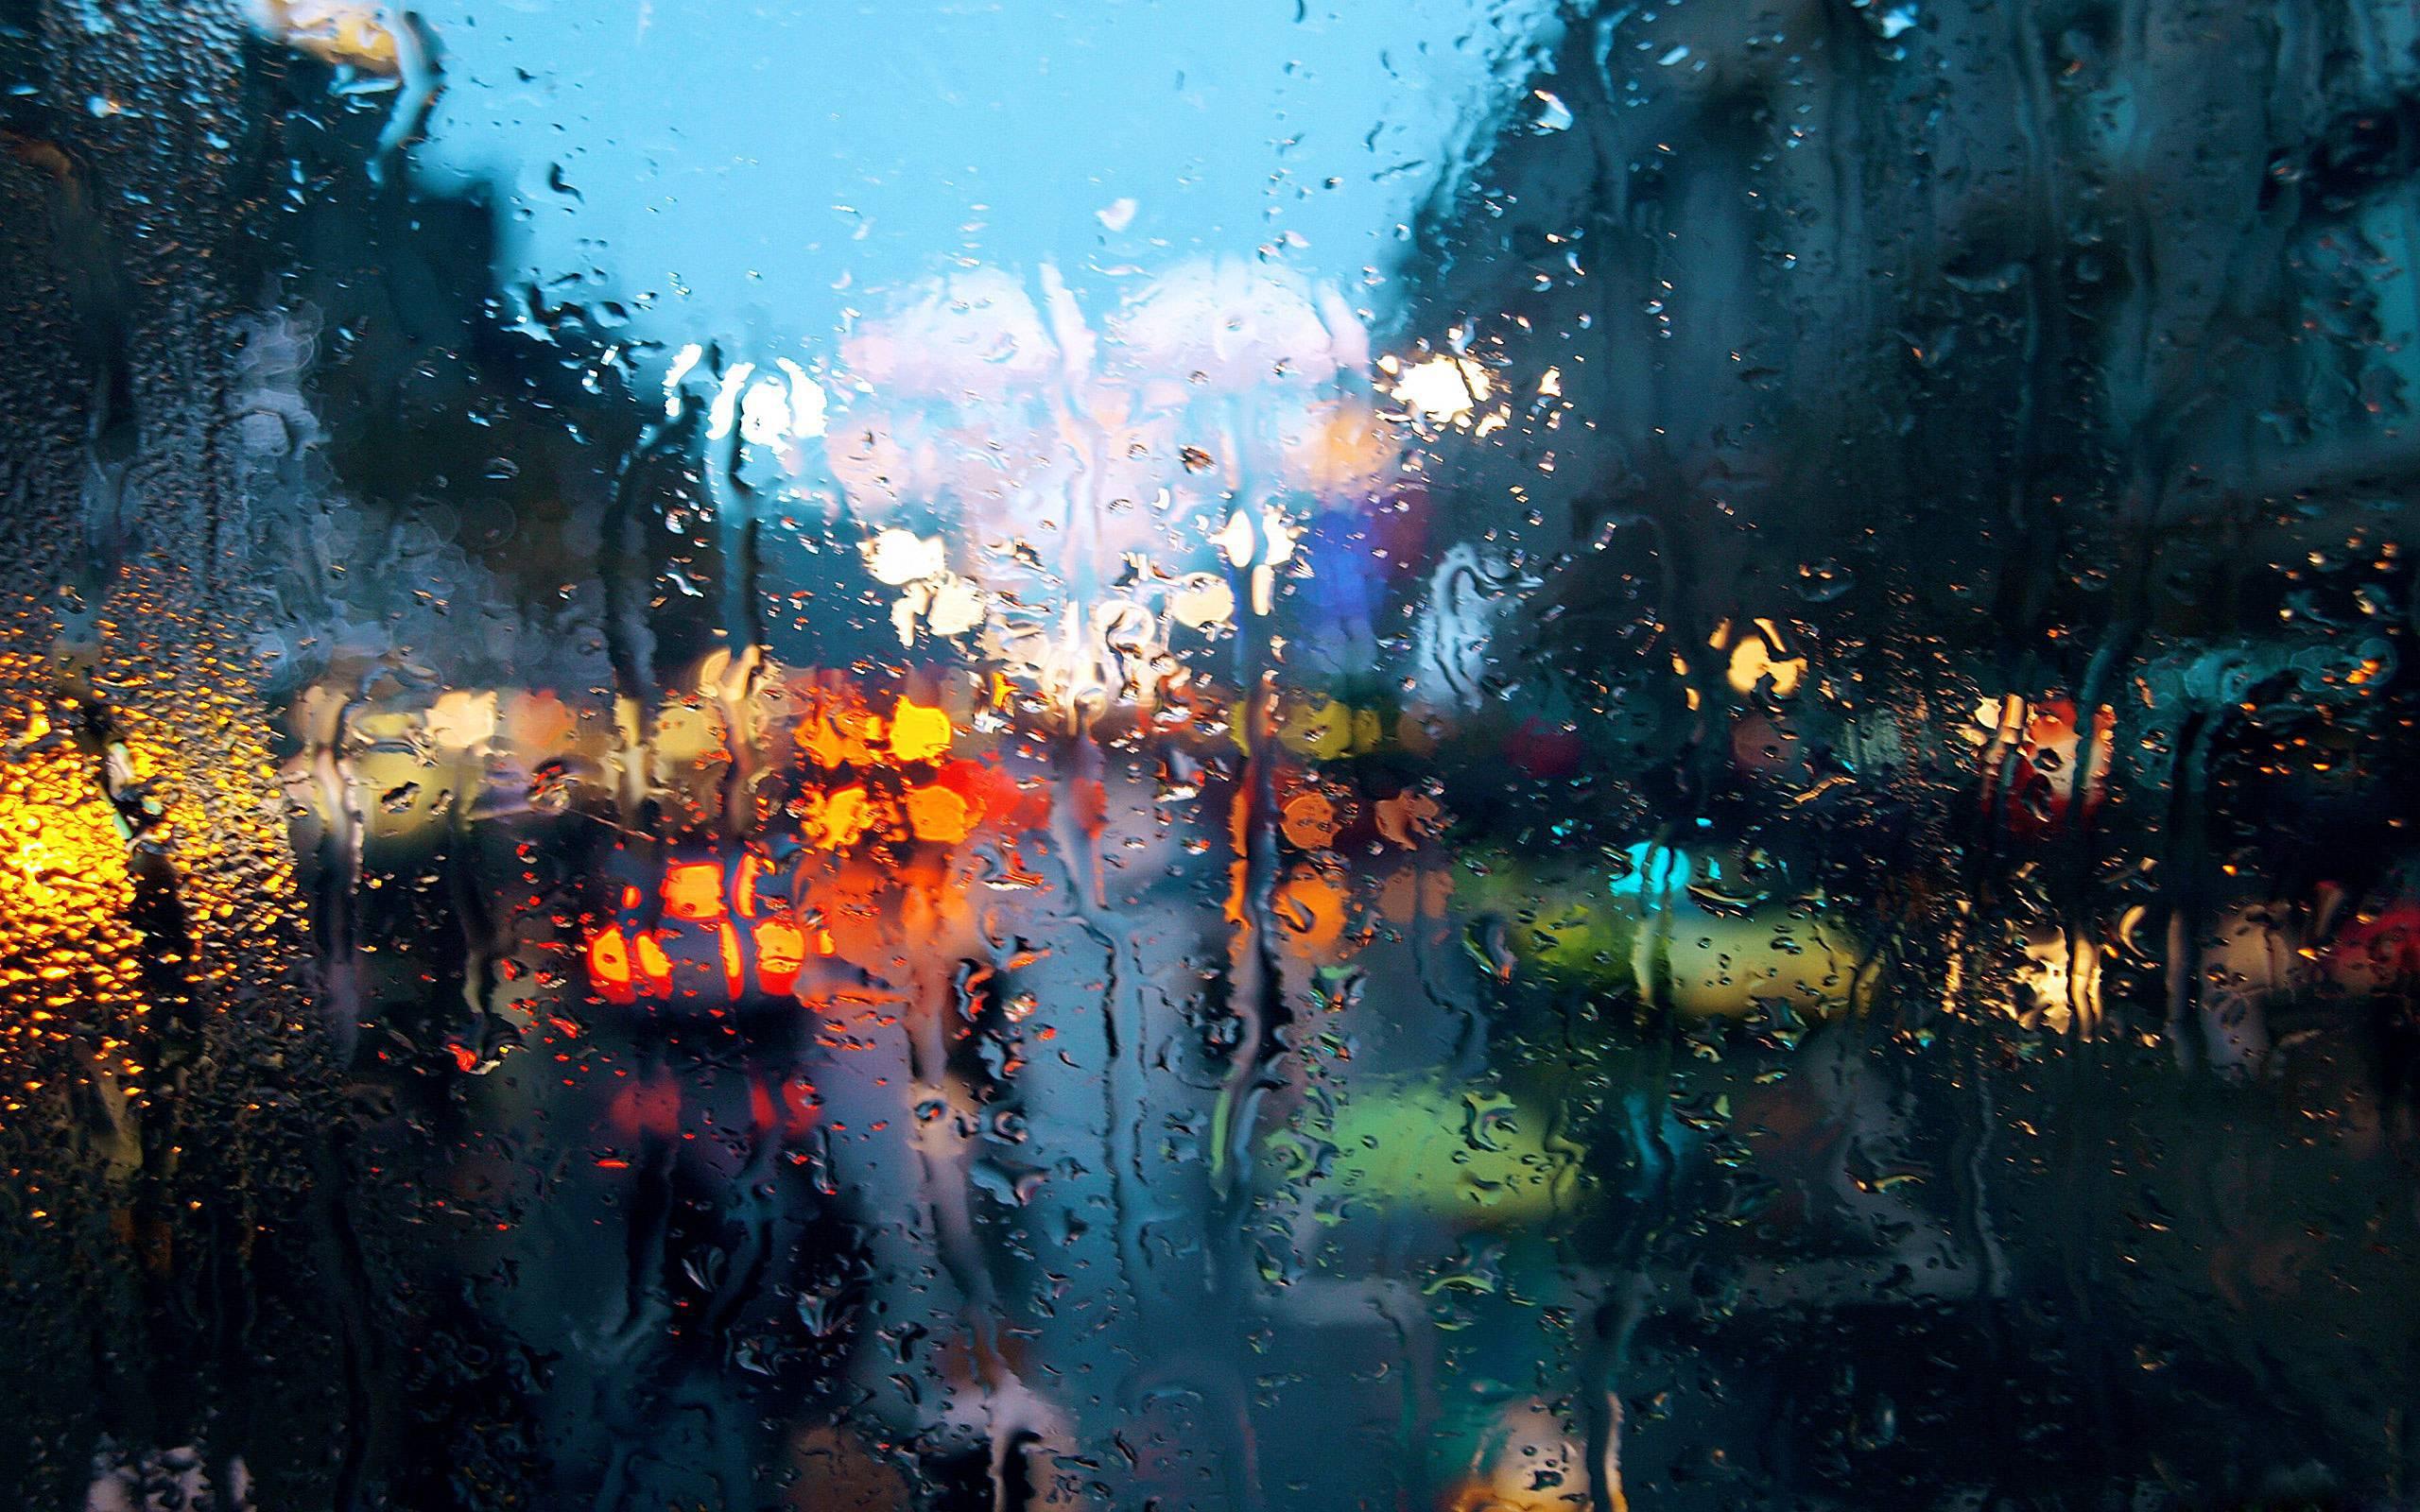 Rain iphone wallpaper tumblr - Wallpapers For Rain Window Background Tumblr